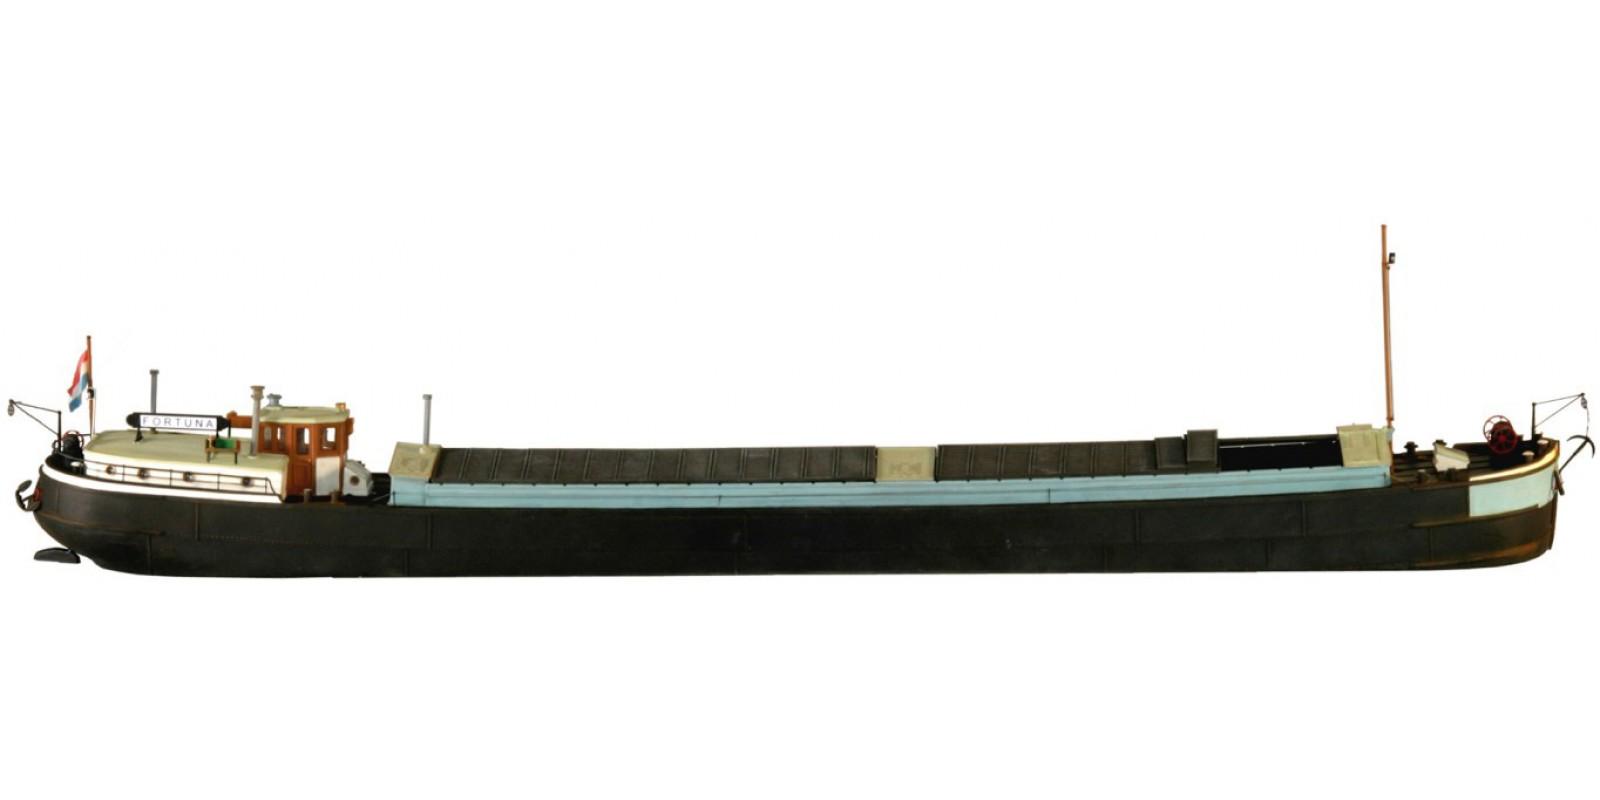 AR50.123 European freighter Spits, 1:87 resin kit, unpainted